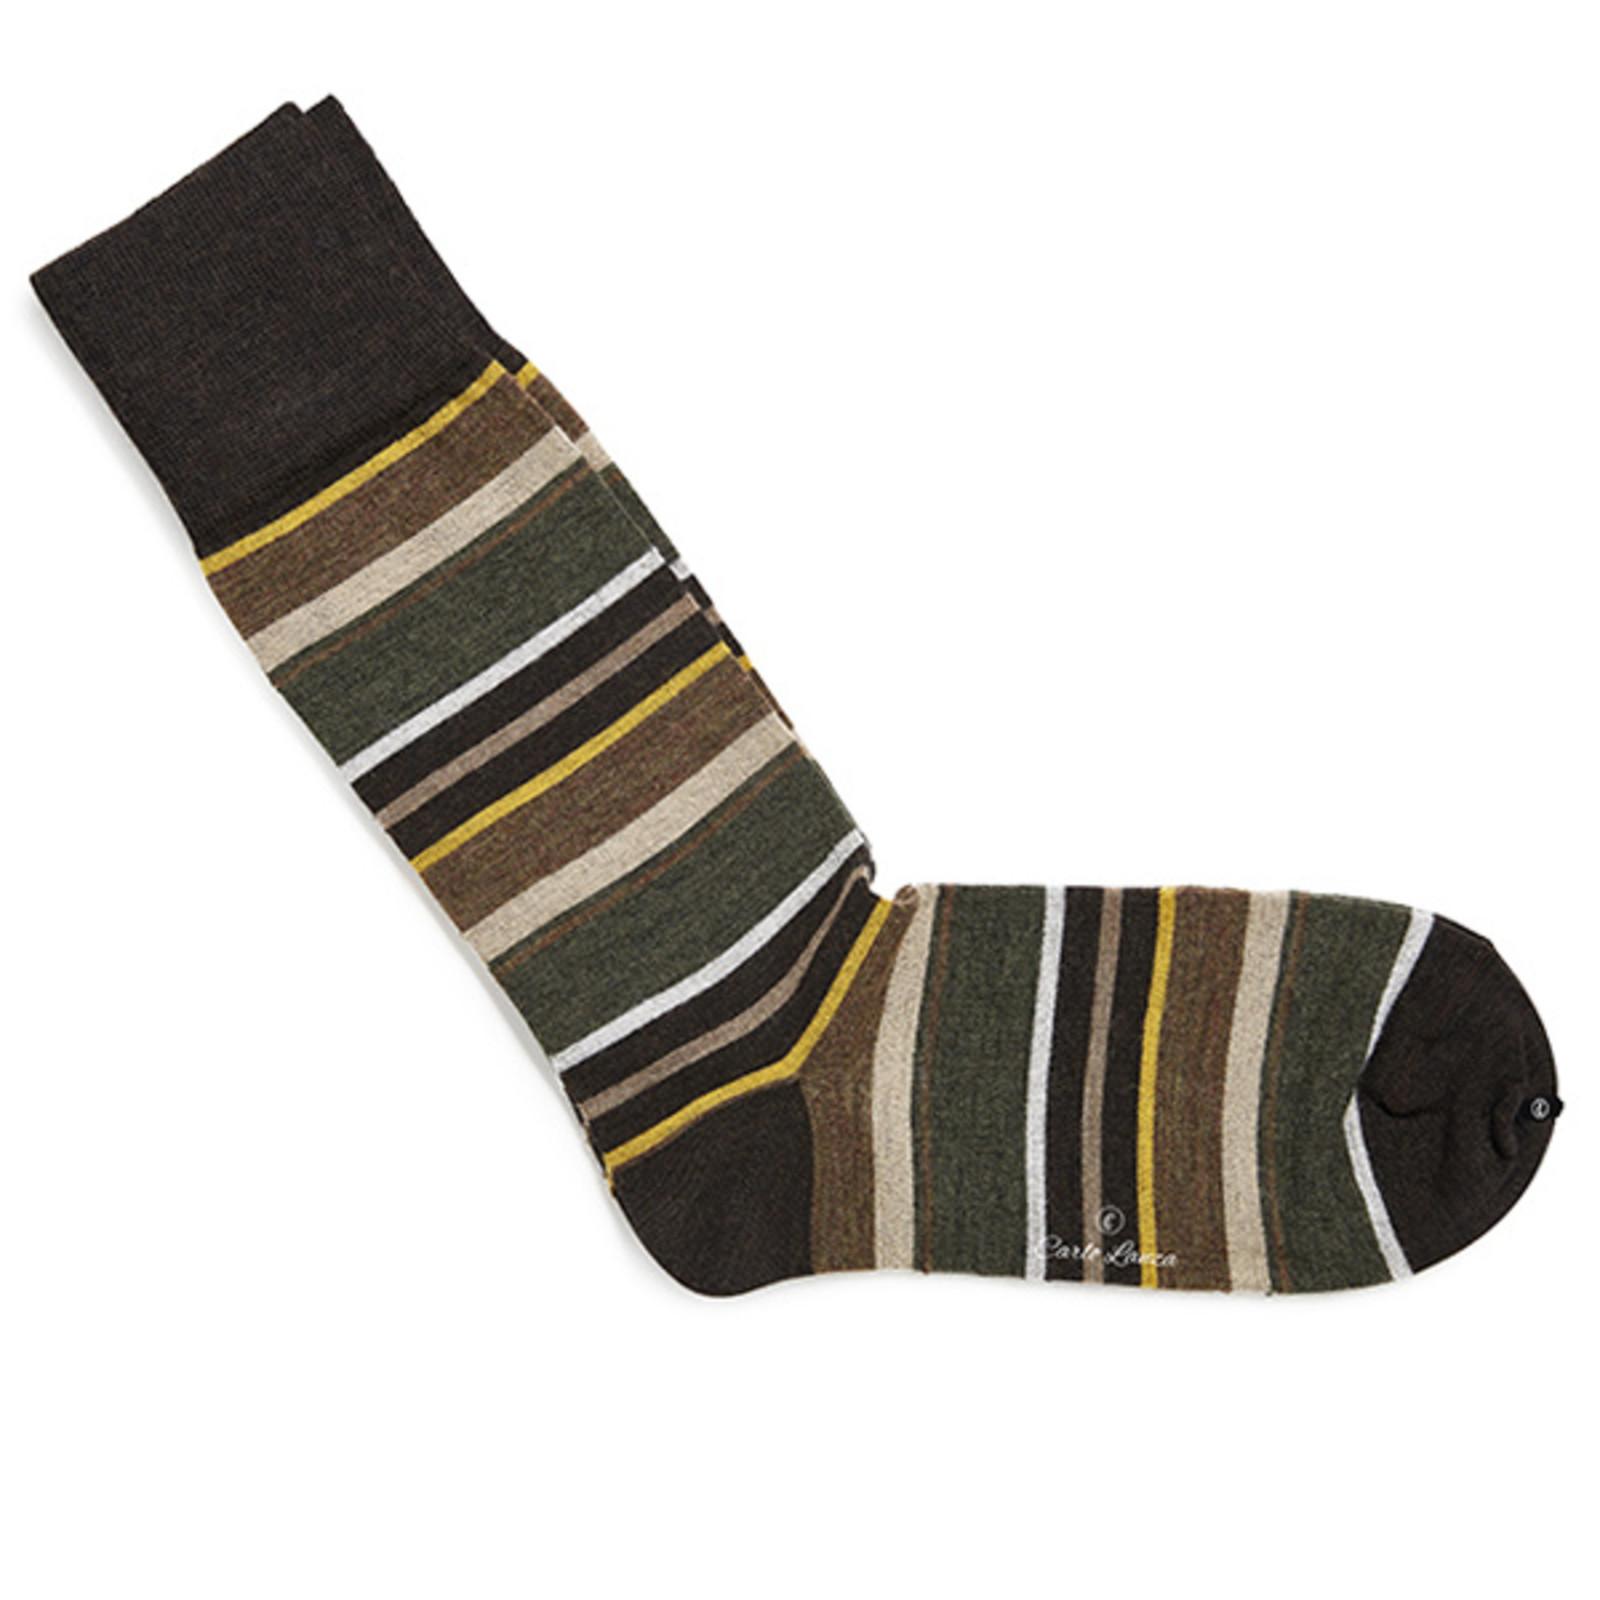 Carlo Lanza Gelbe gestreifte Socken Merino Wolle